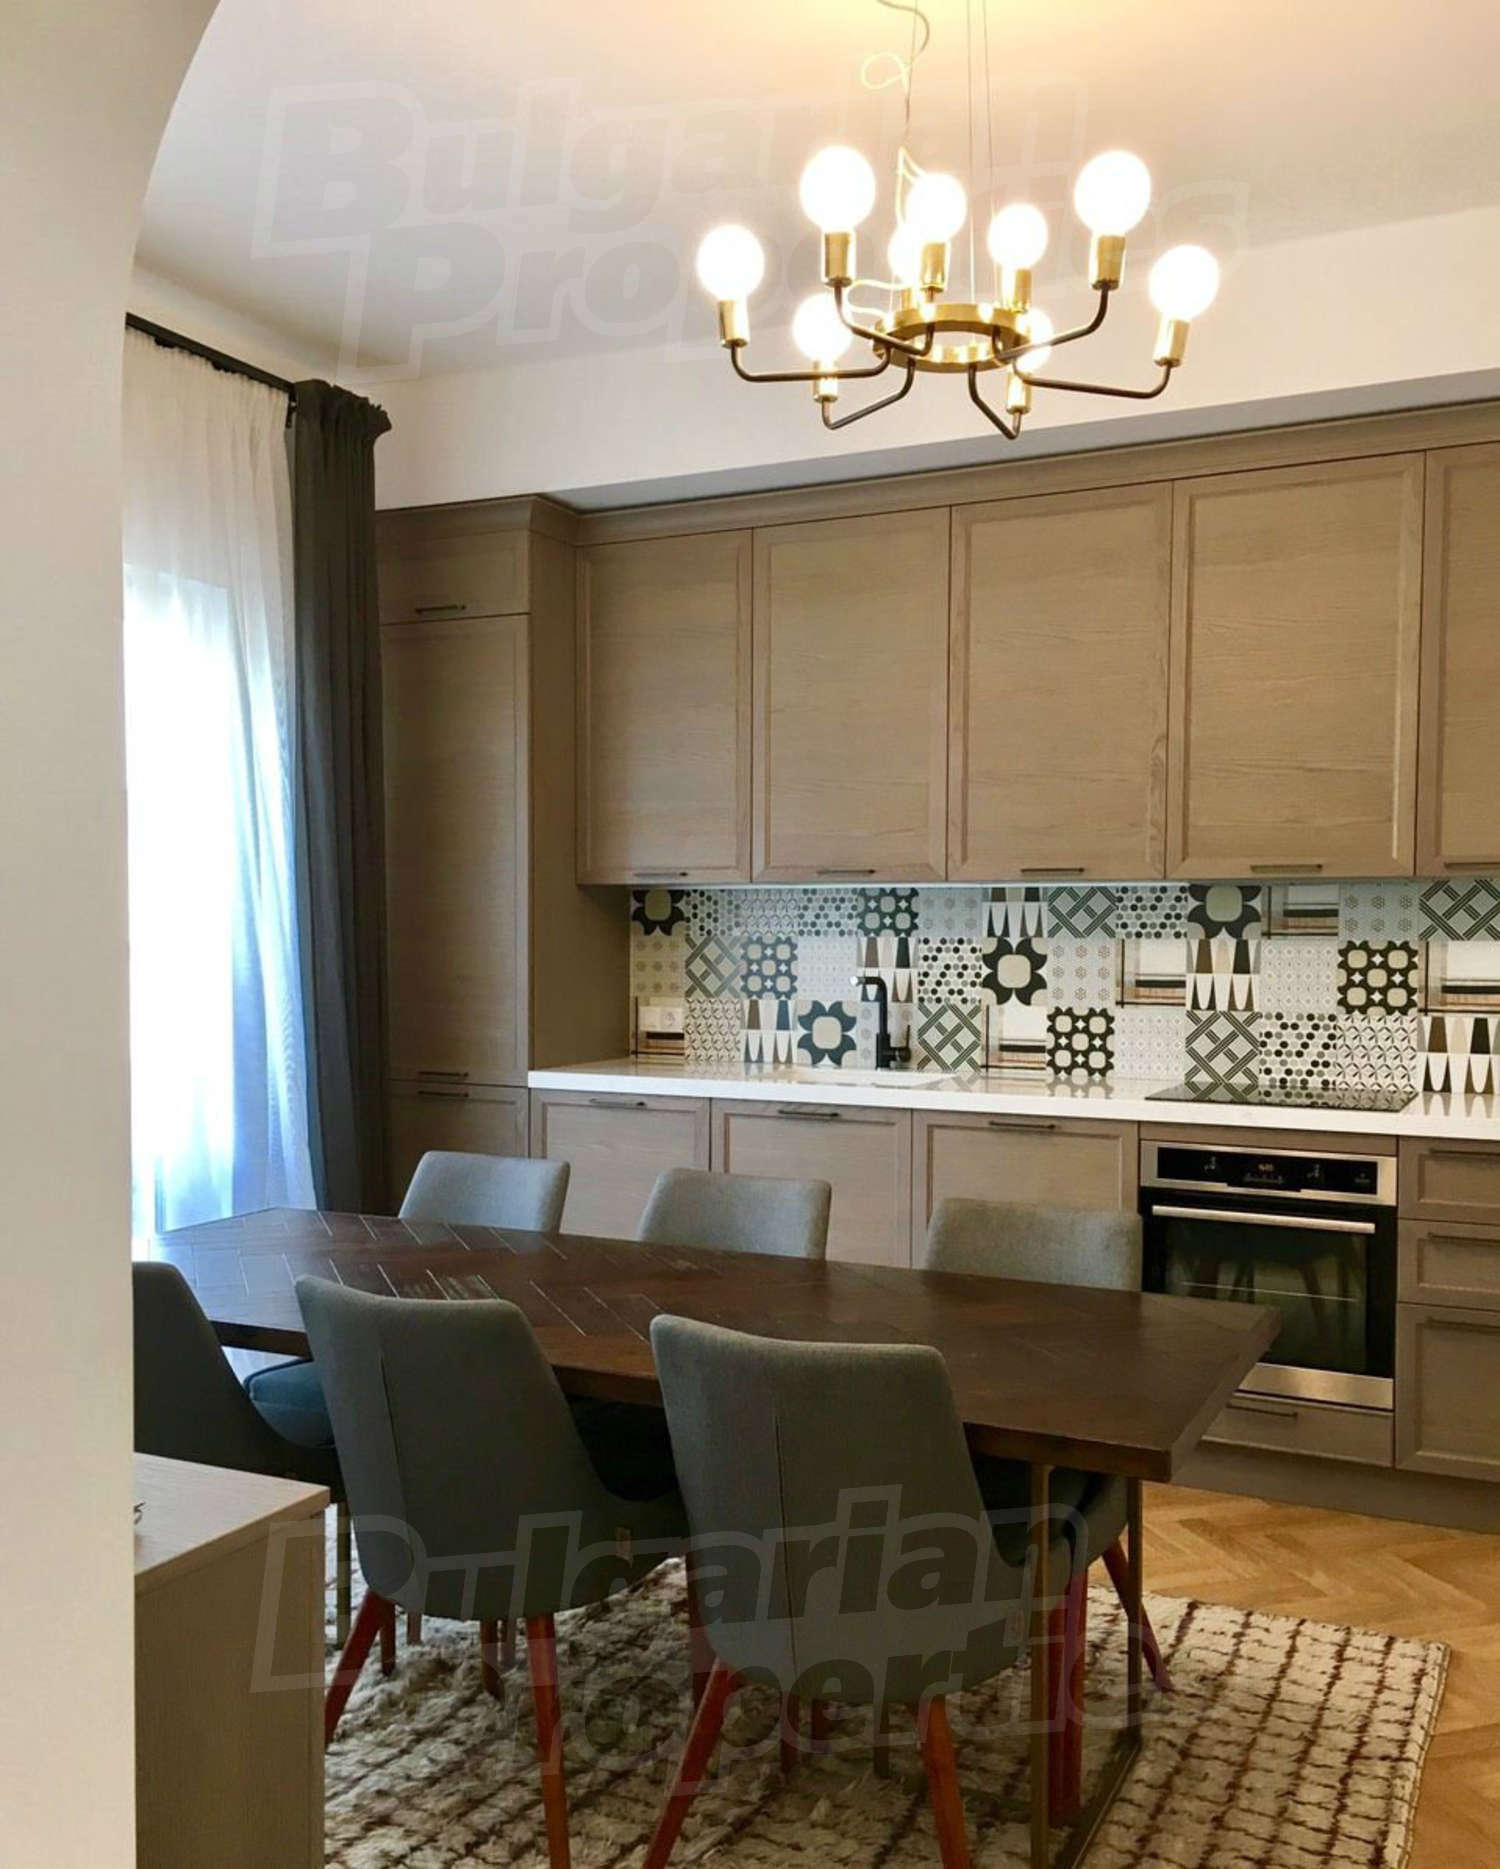 Nice 3 Bedroom House For Rent: 3-bedroom Apartment For Rent In Sofia, QuarterDoktorski